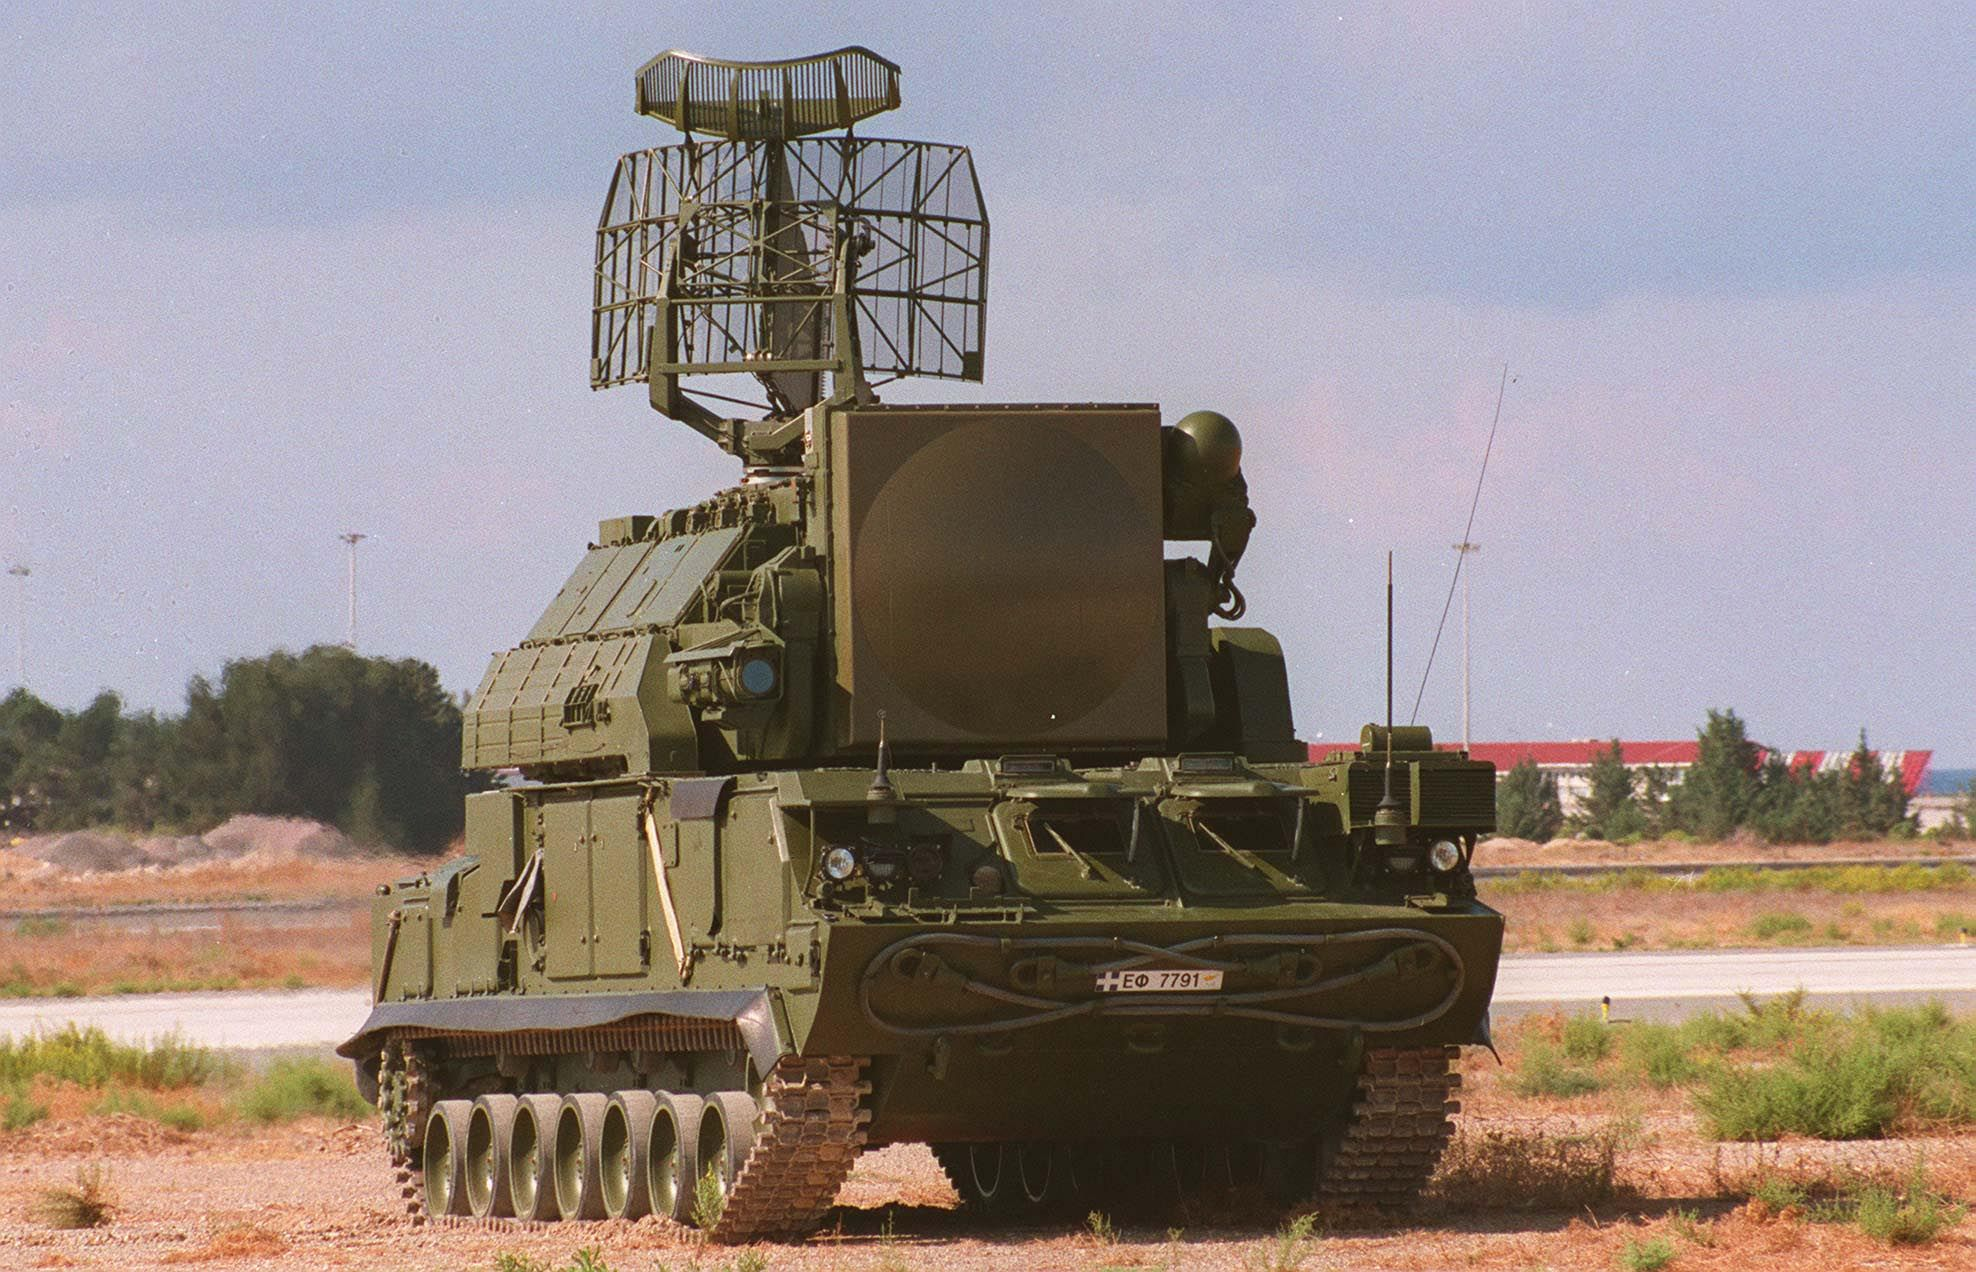 9K330 Tor SA-15 Gauntlet Short...